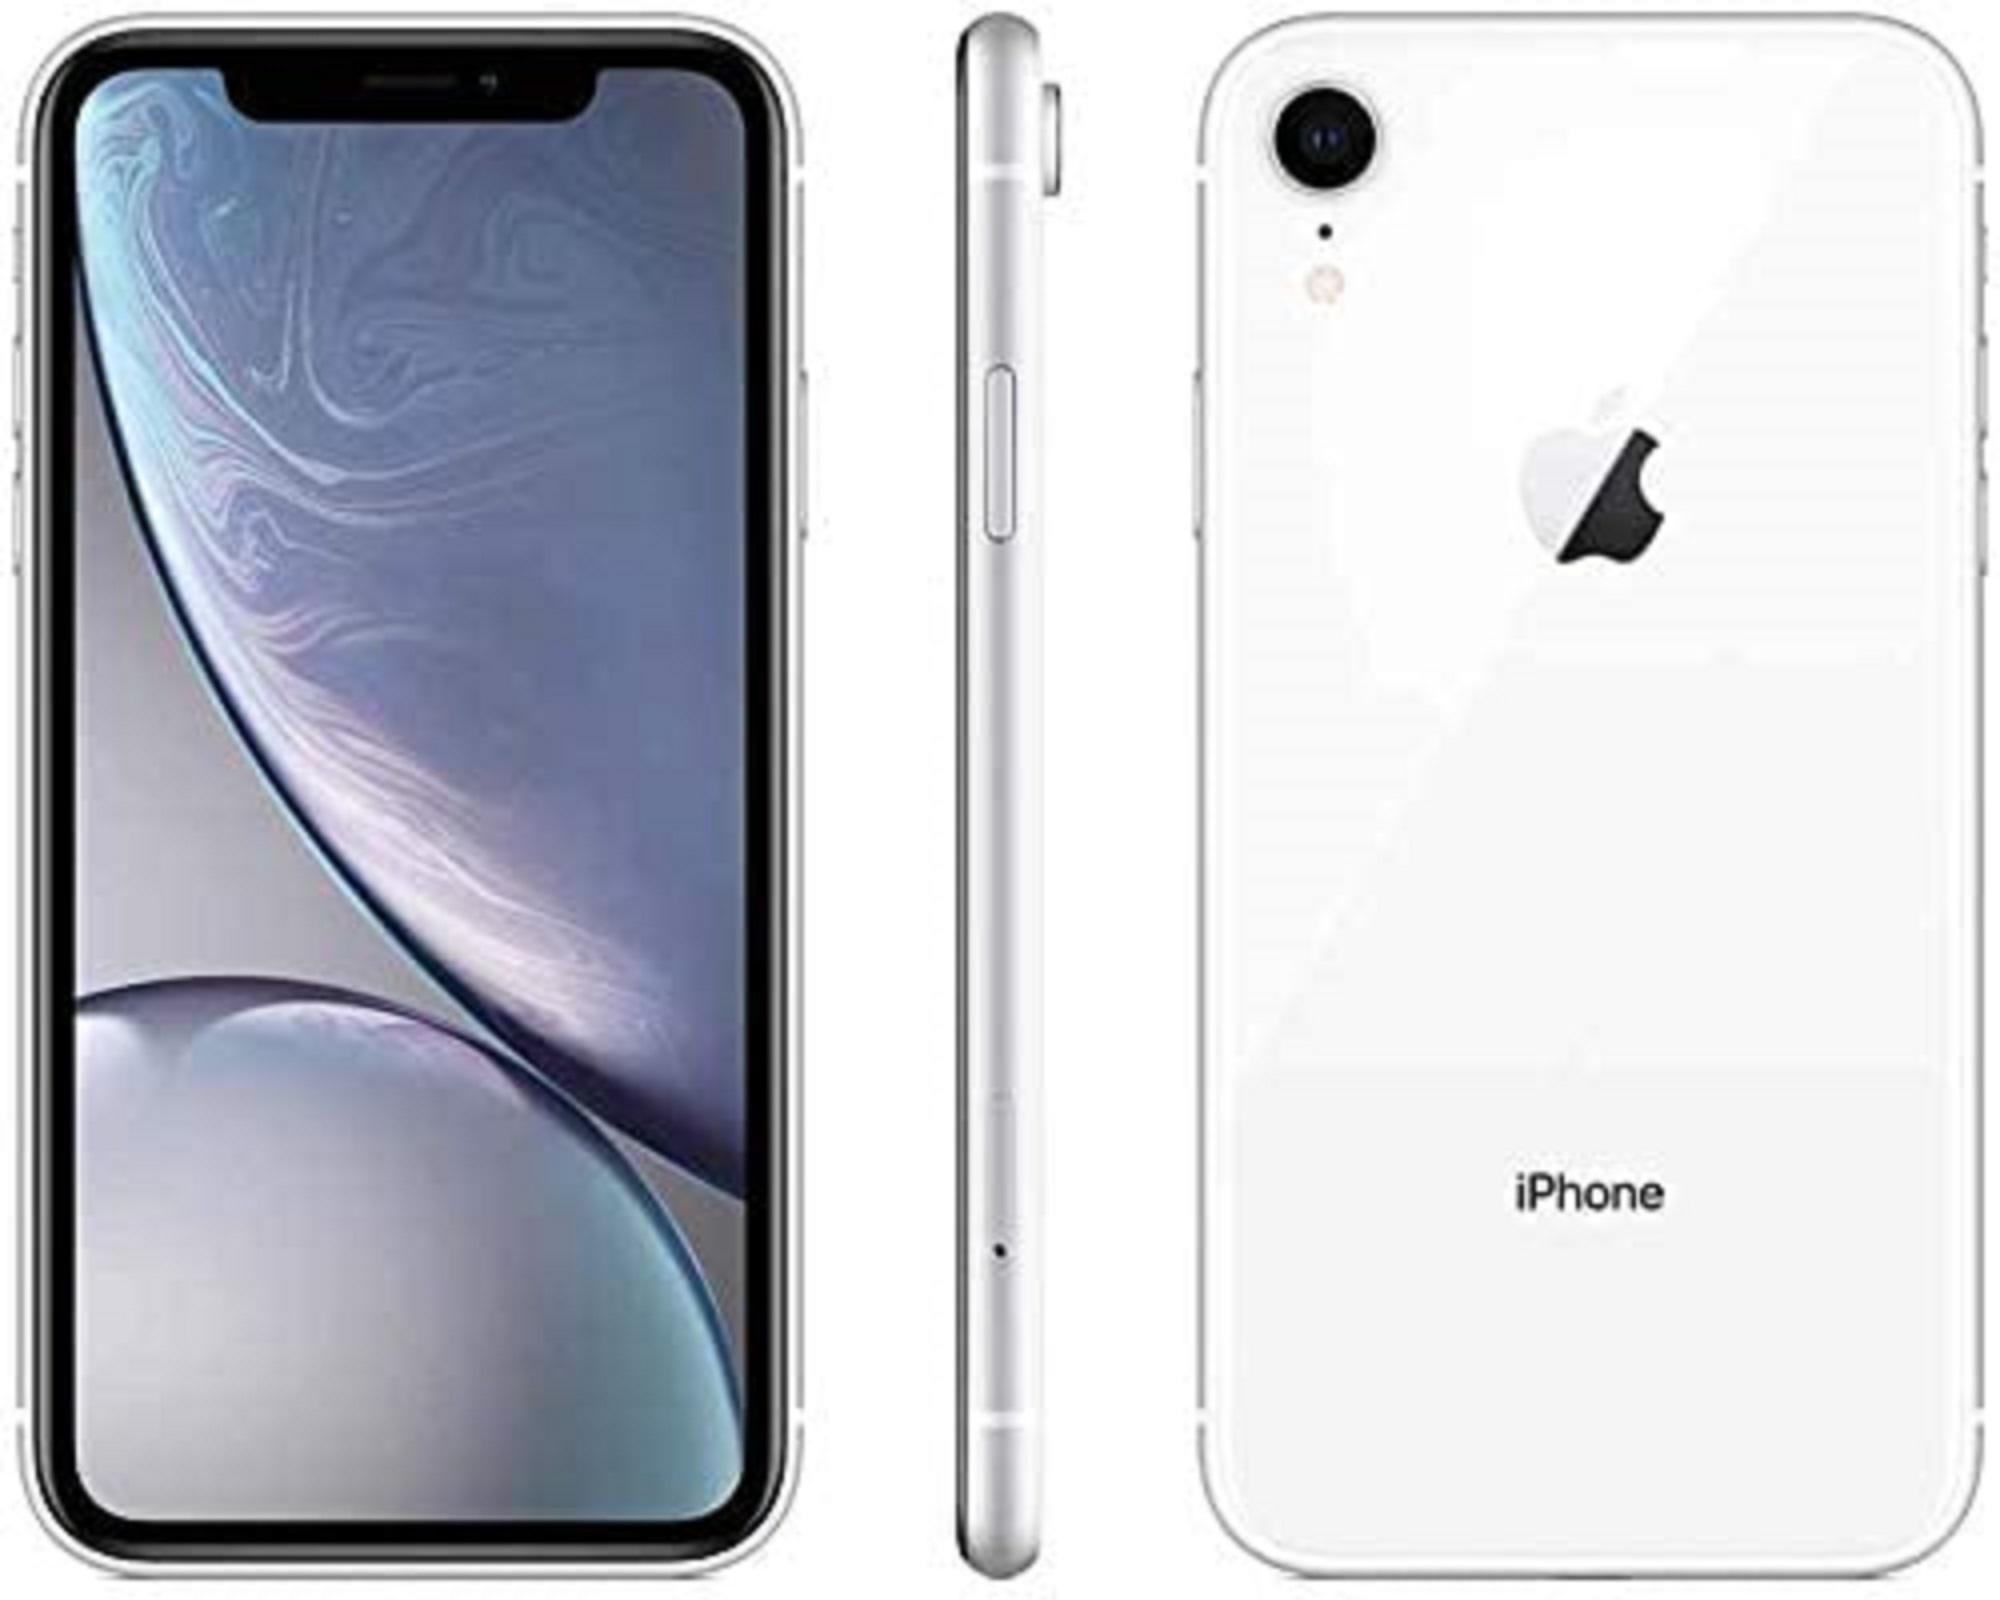 thumbnail 21 - Apple iPhone XR 64GB Factory Unlocked Smartphone 4G LTE iOS Smartphone - Very